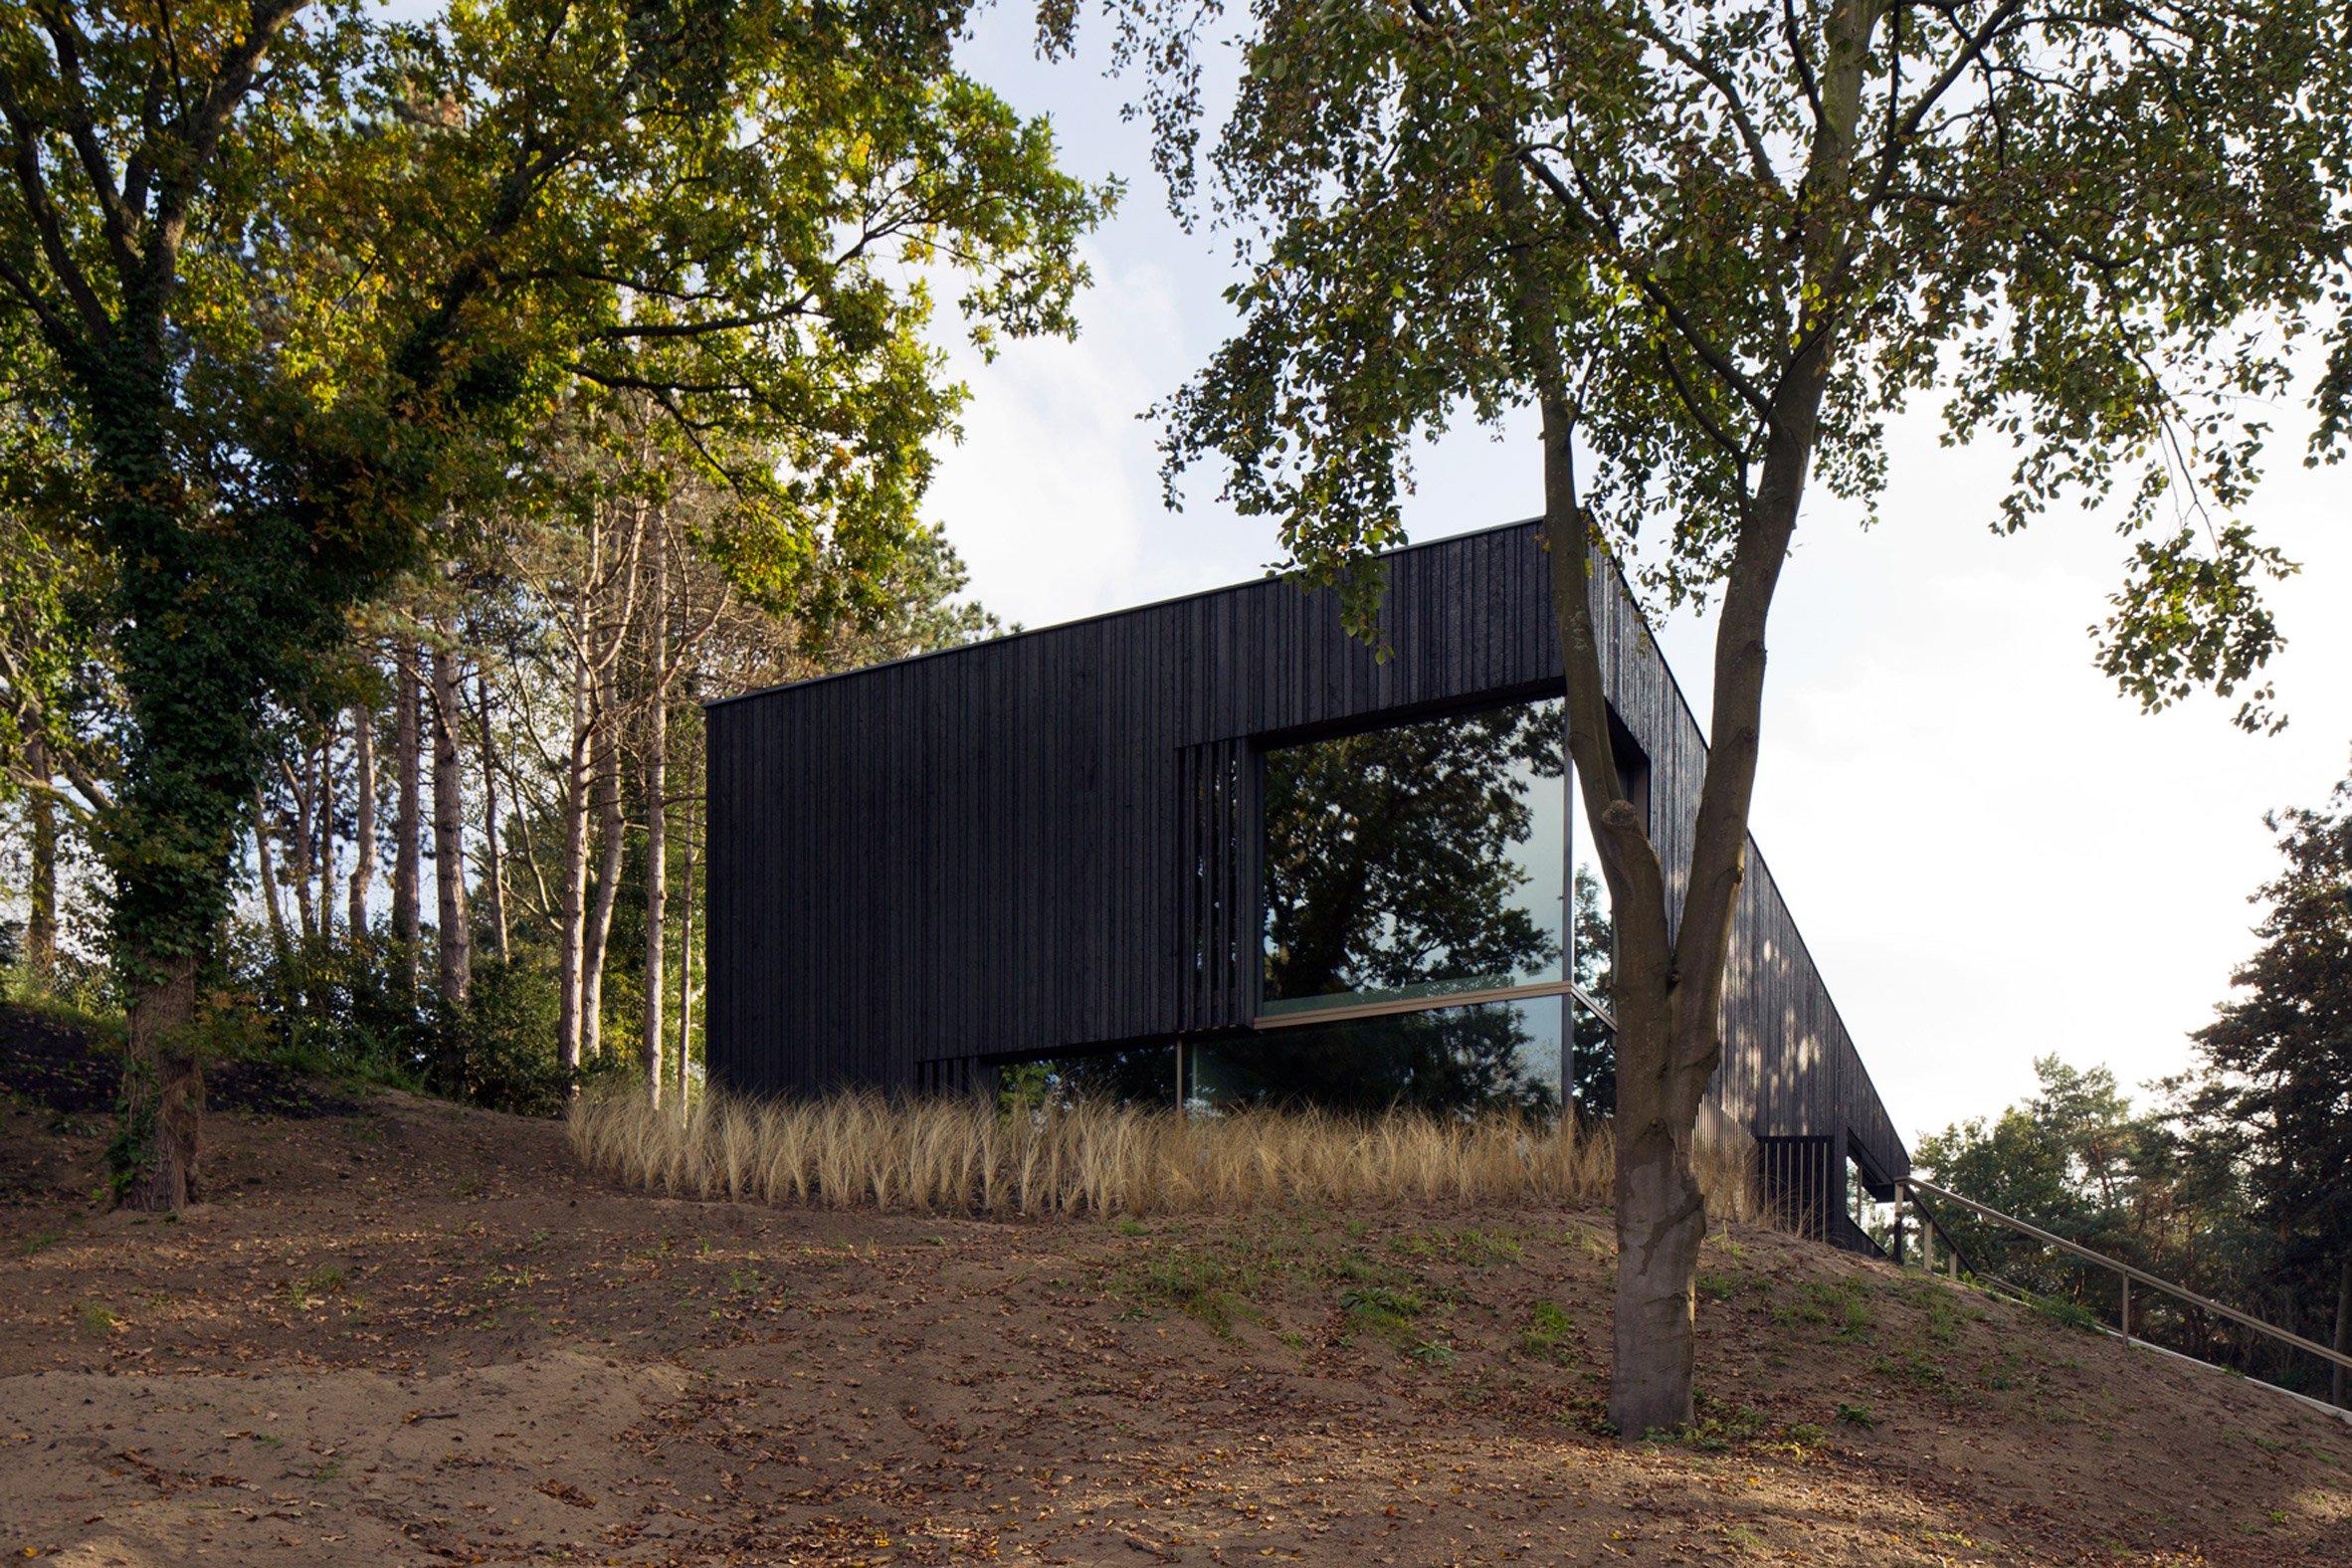 villa-meijendel-ronald-knappers-architecture-residential-netherlands_dezeen_2364_col_7